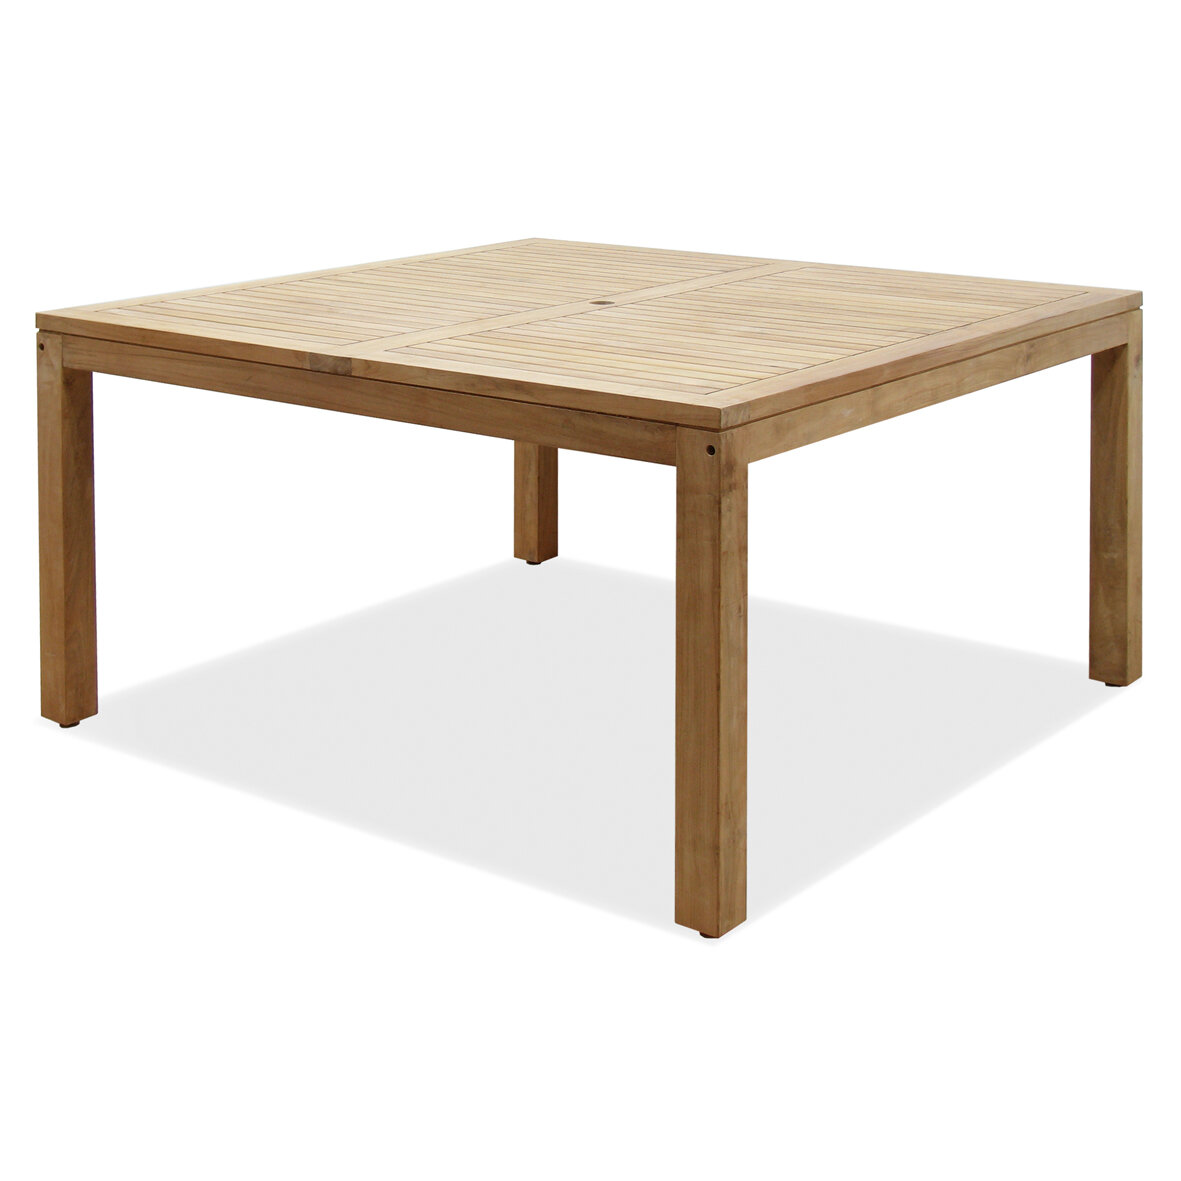 Tables basses de jardin: Caractéristiques - Teck | Wayfair.ca